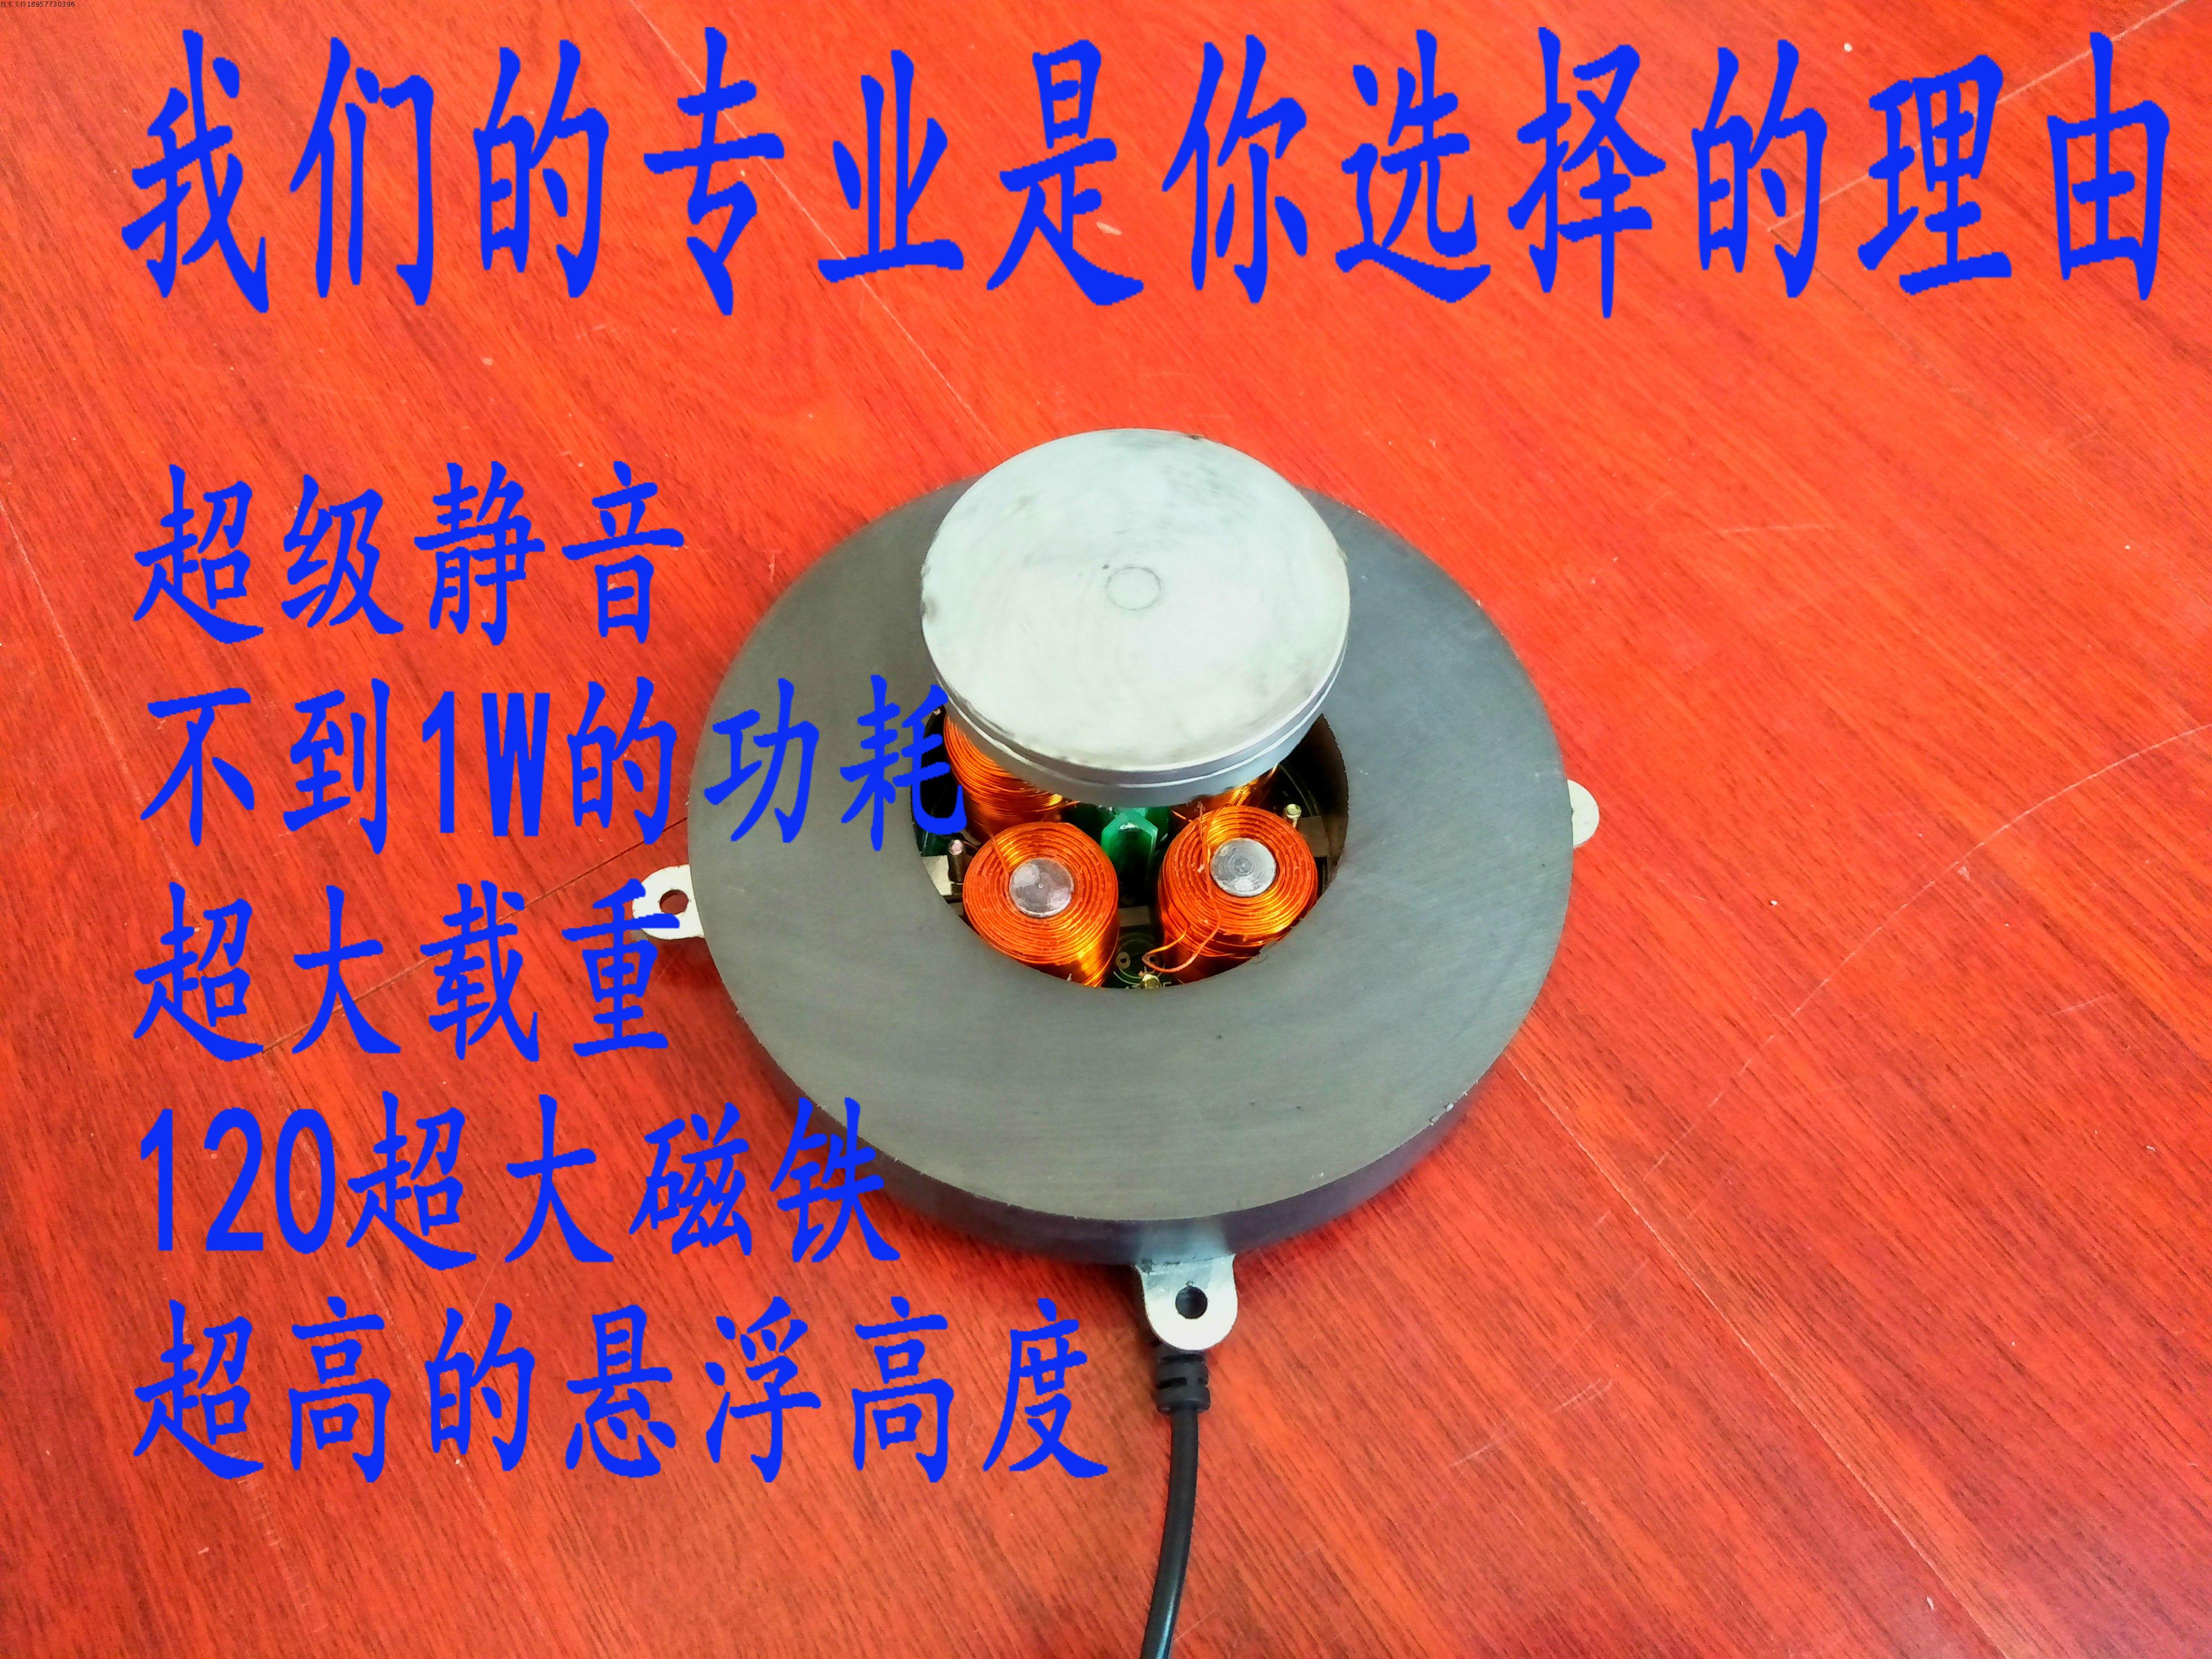 800-1000g magnetic suspension DIY